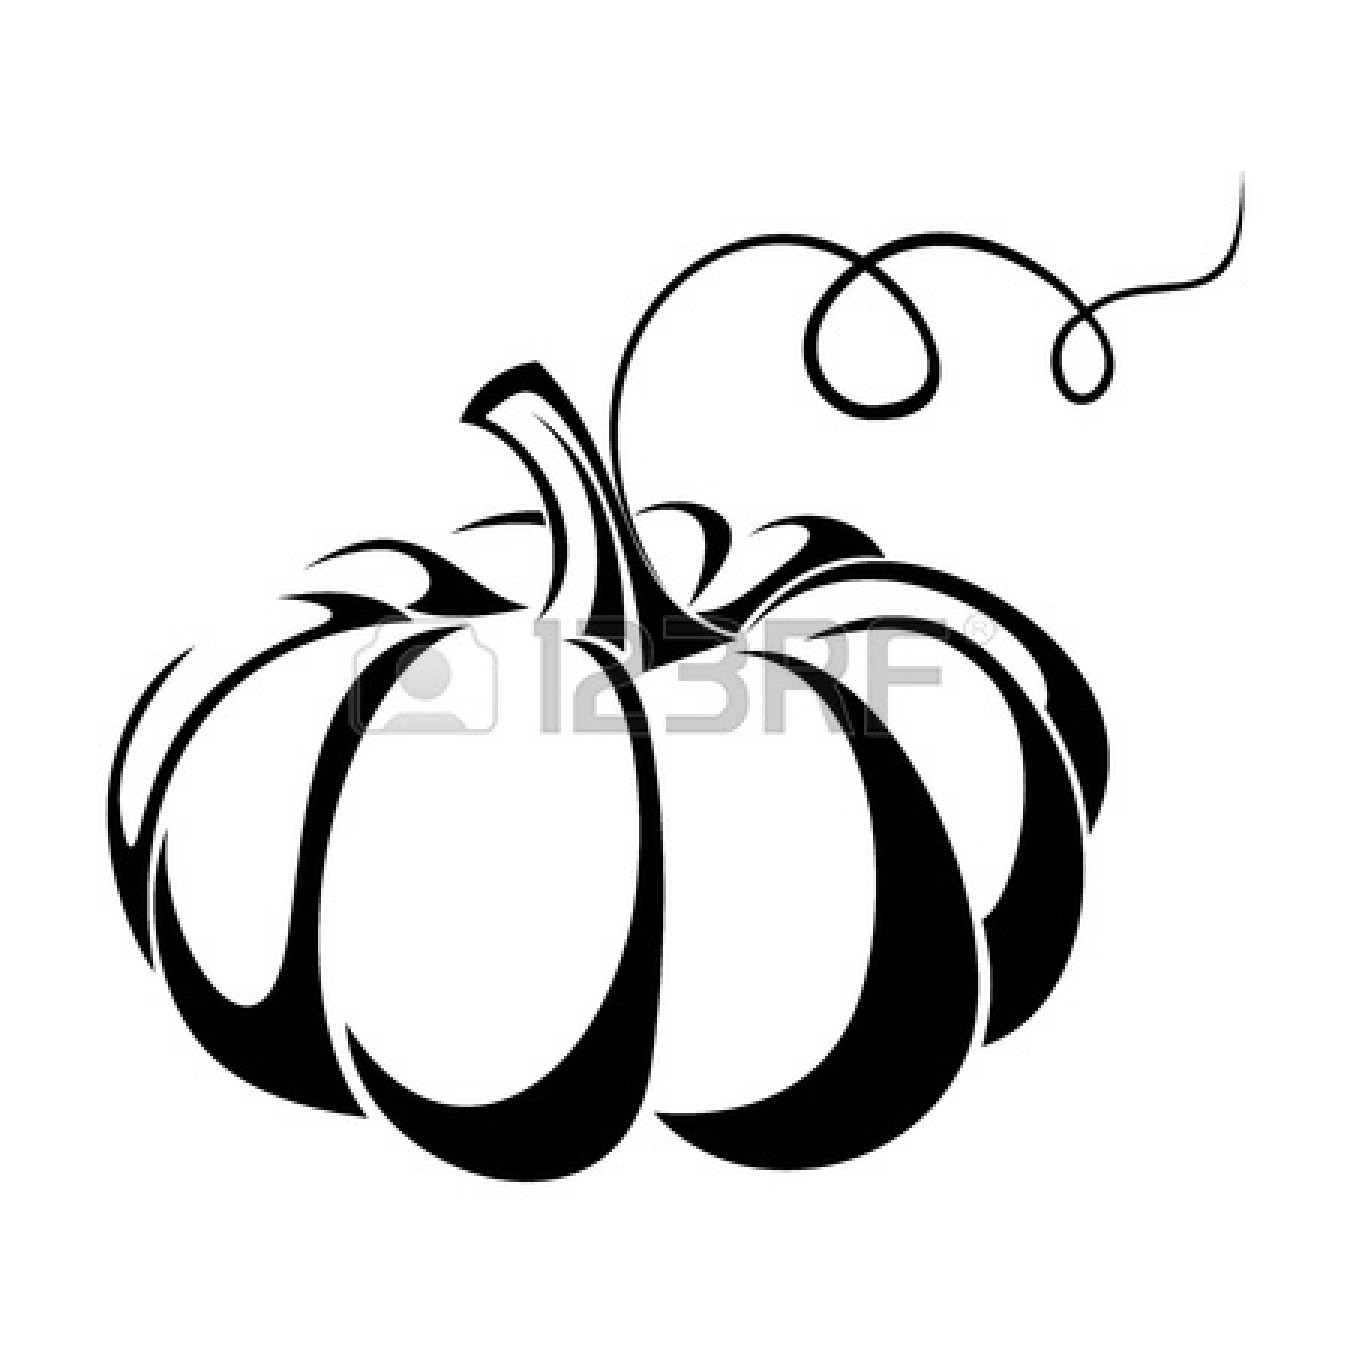 pumpkin : Pumpkin Vector black | Clipart Panda - Free ...